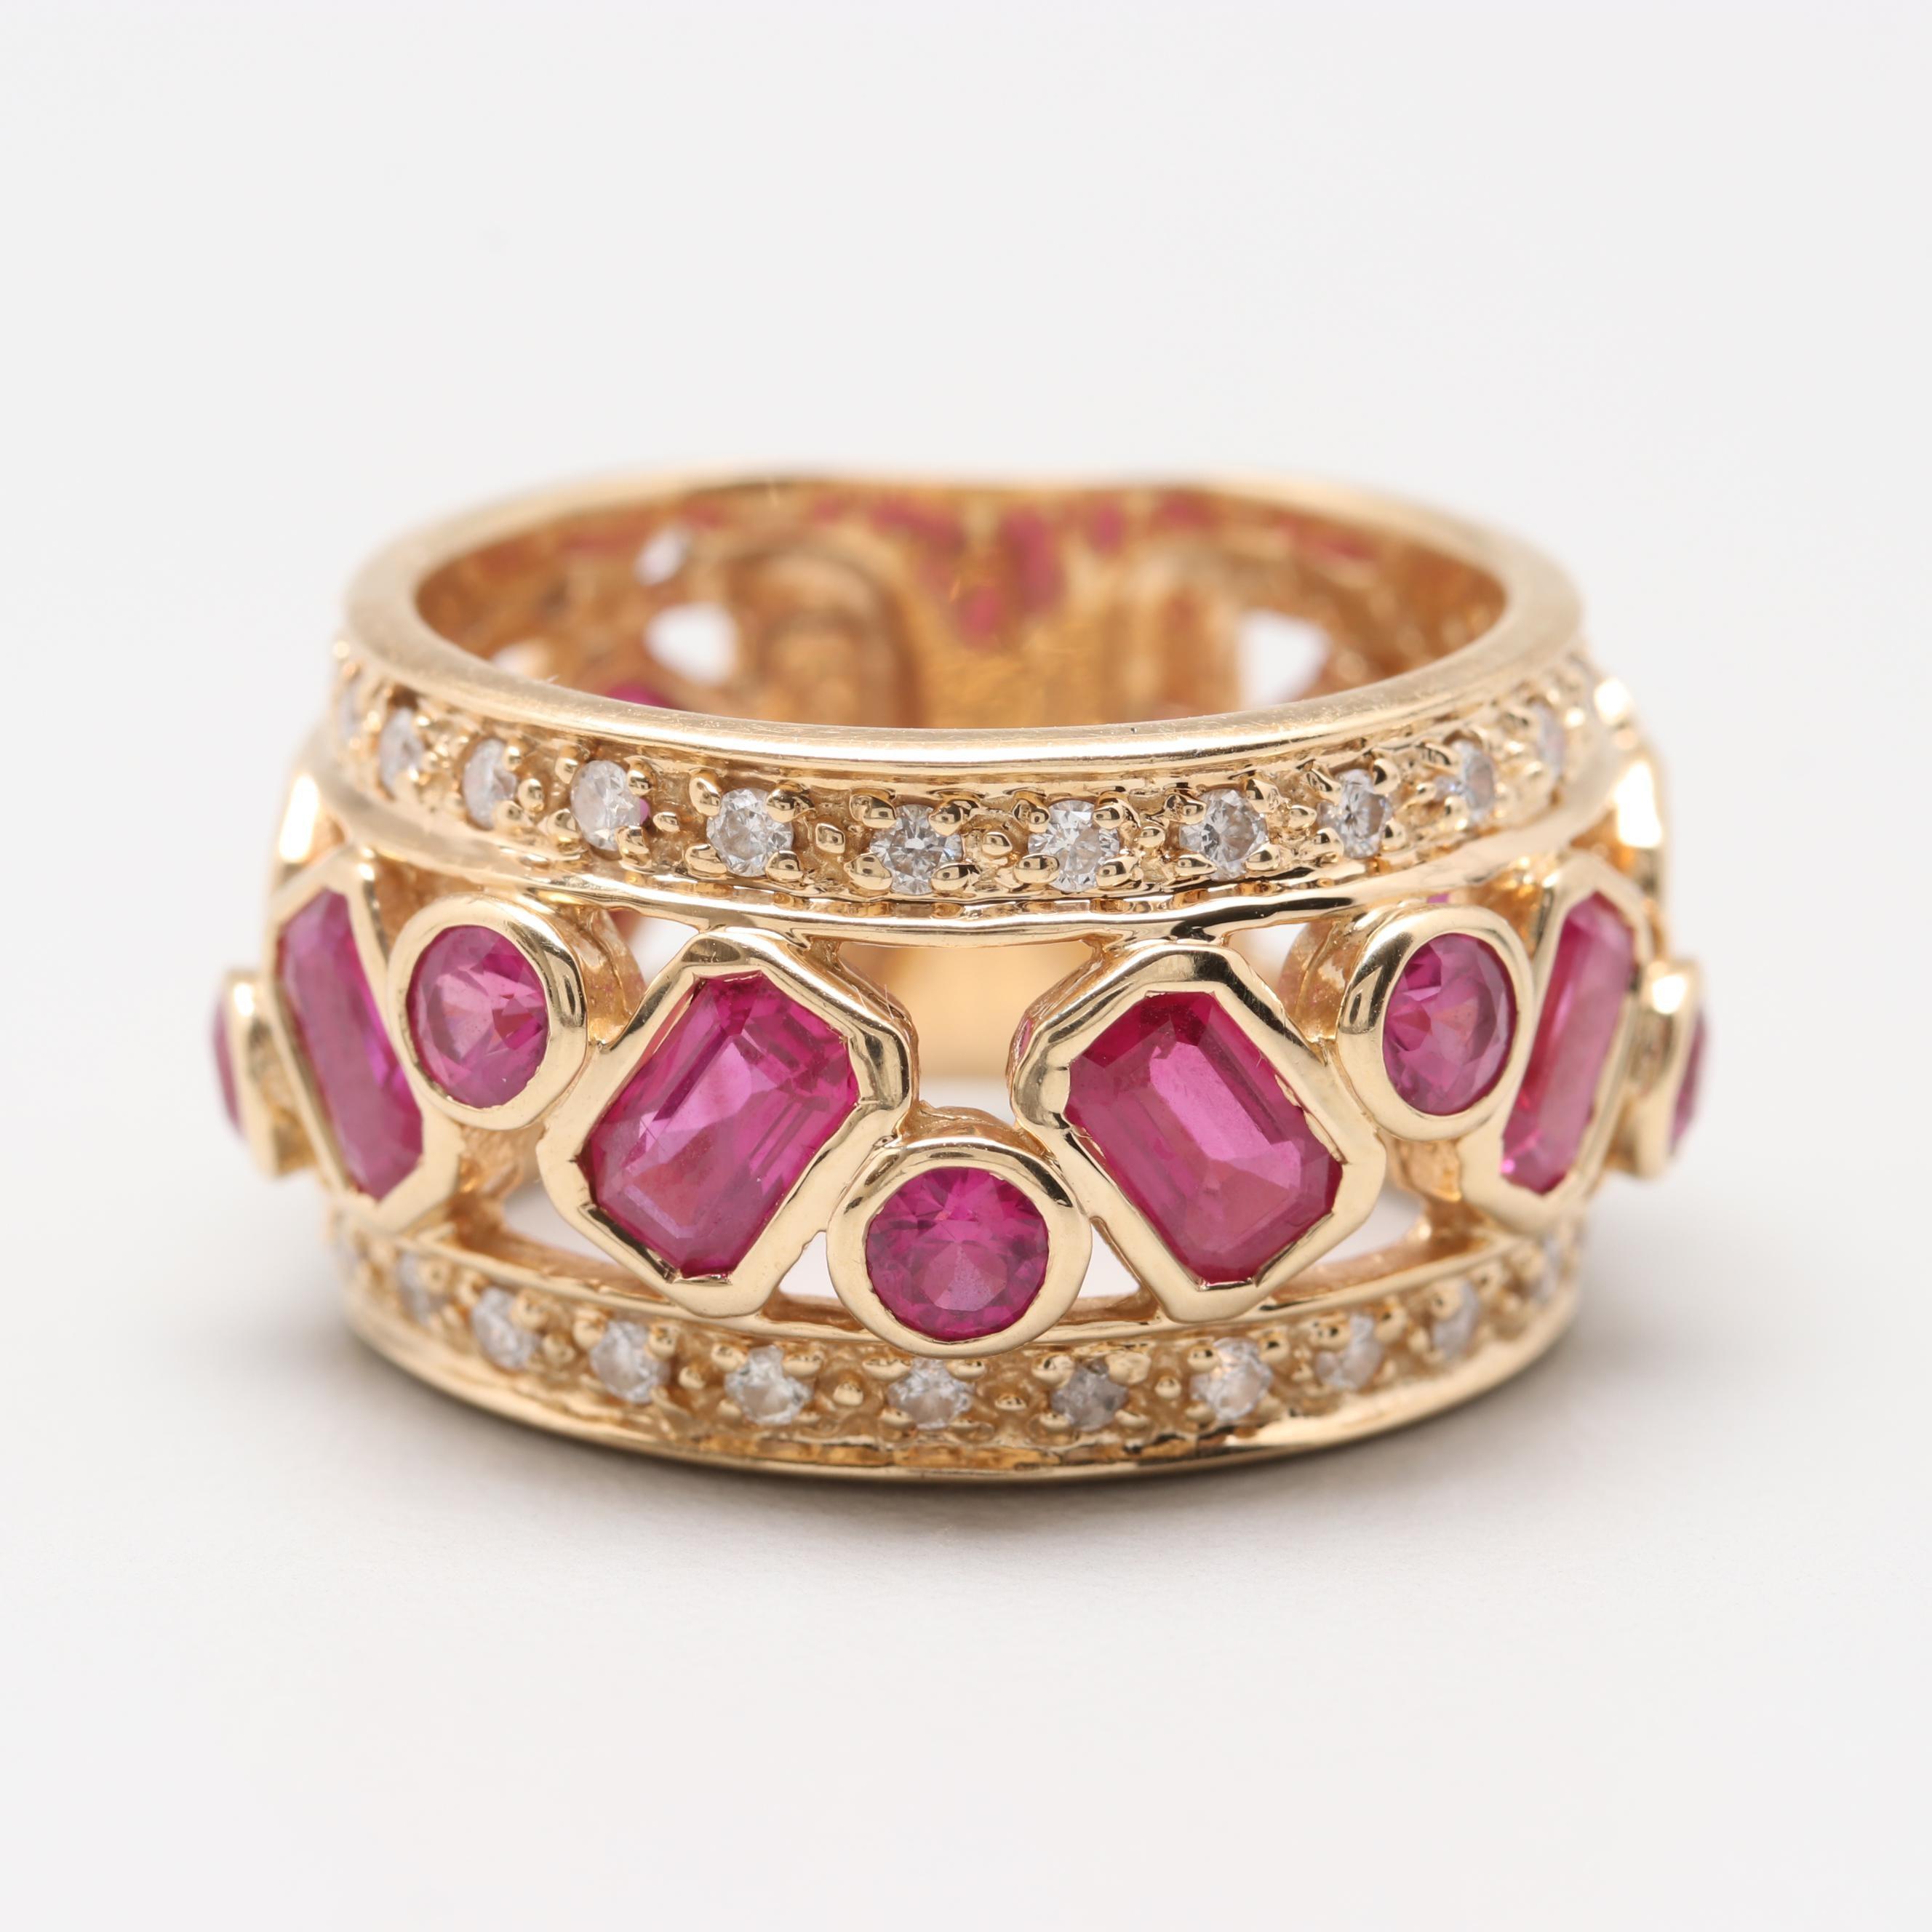 Sonia B. 14K Yellow Gold Ruby and Diamond Ring